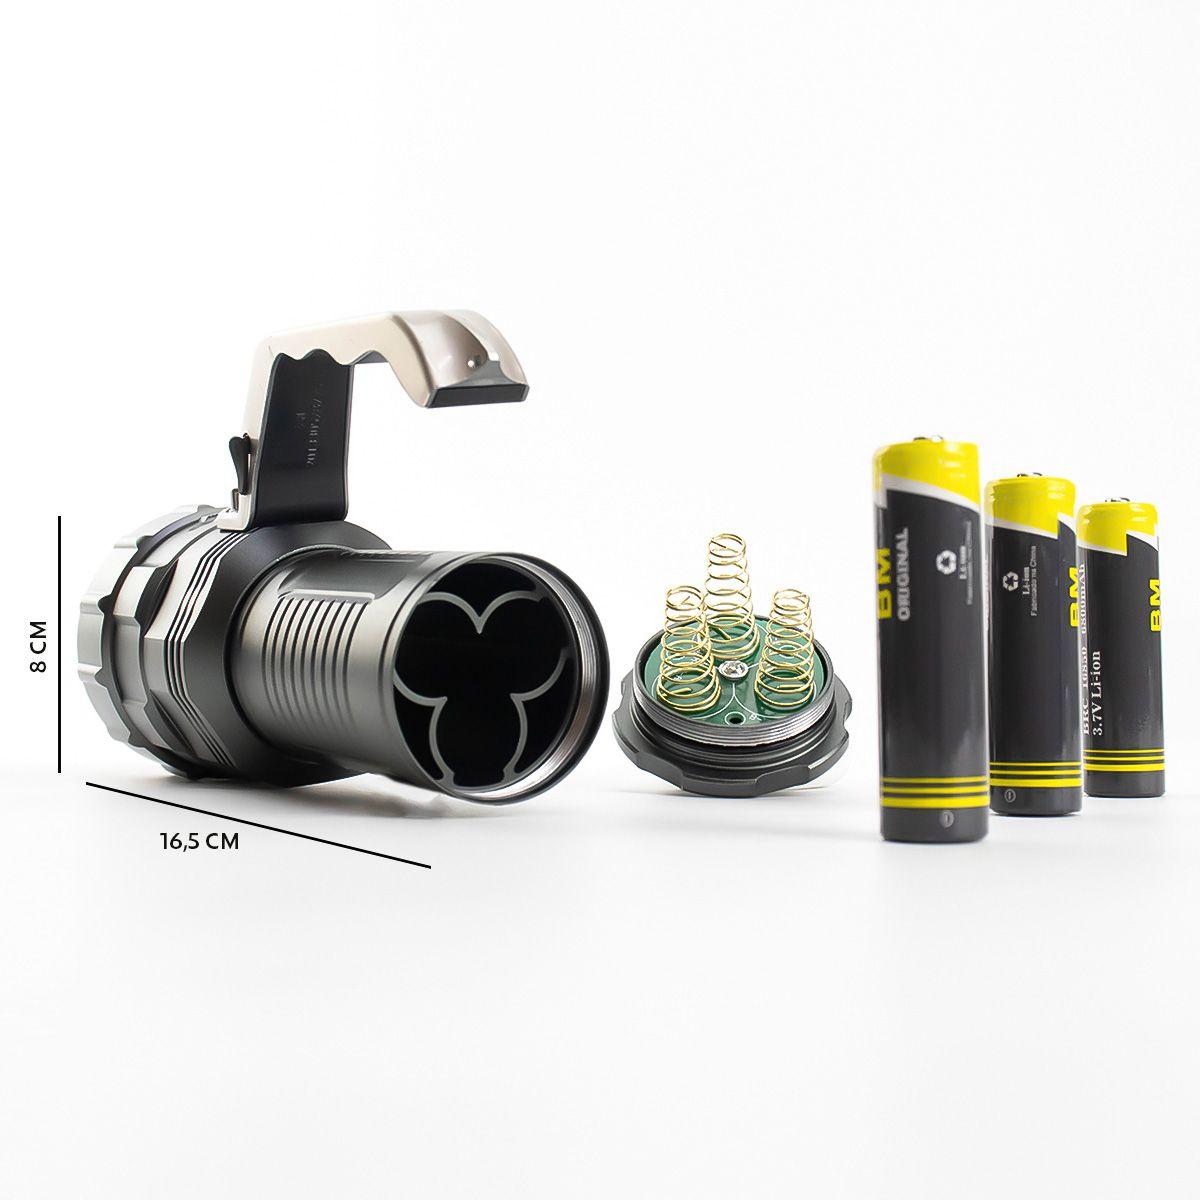 KIT 4x Lanterna Led Recarregável de 1200 Lumens B-Max BM-8806